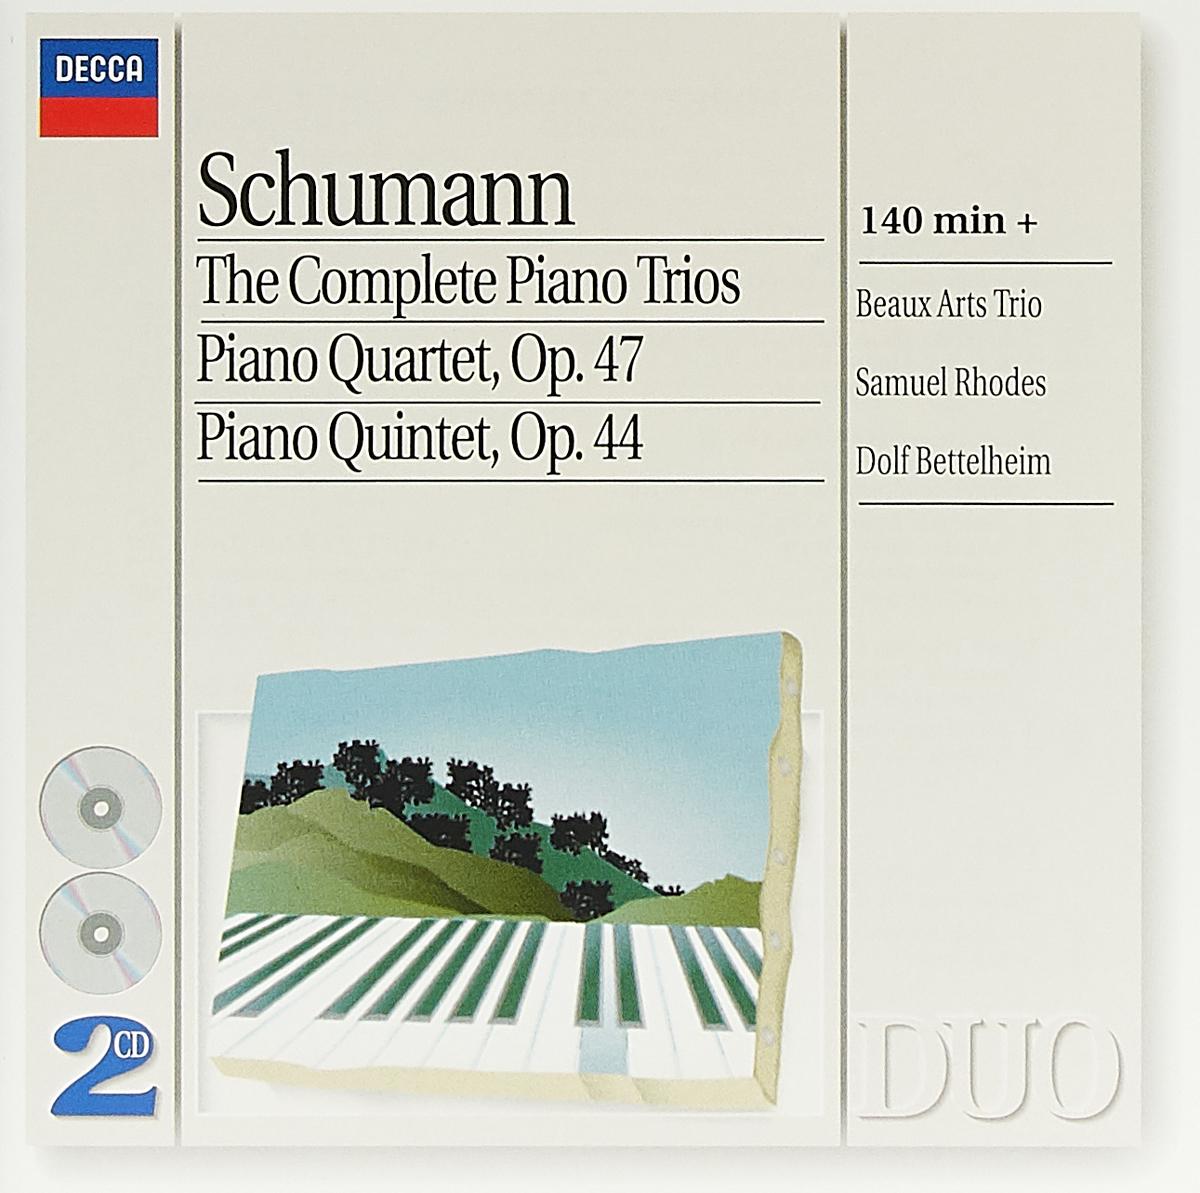 Beaux Arts Trio Beaux Arts Trio. Schumann: The Complete Piano Trios/ Piano Quartet Op 44 & 47 (2 CD) l boëllmann piano trio op 19